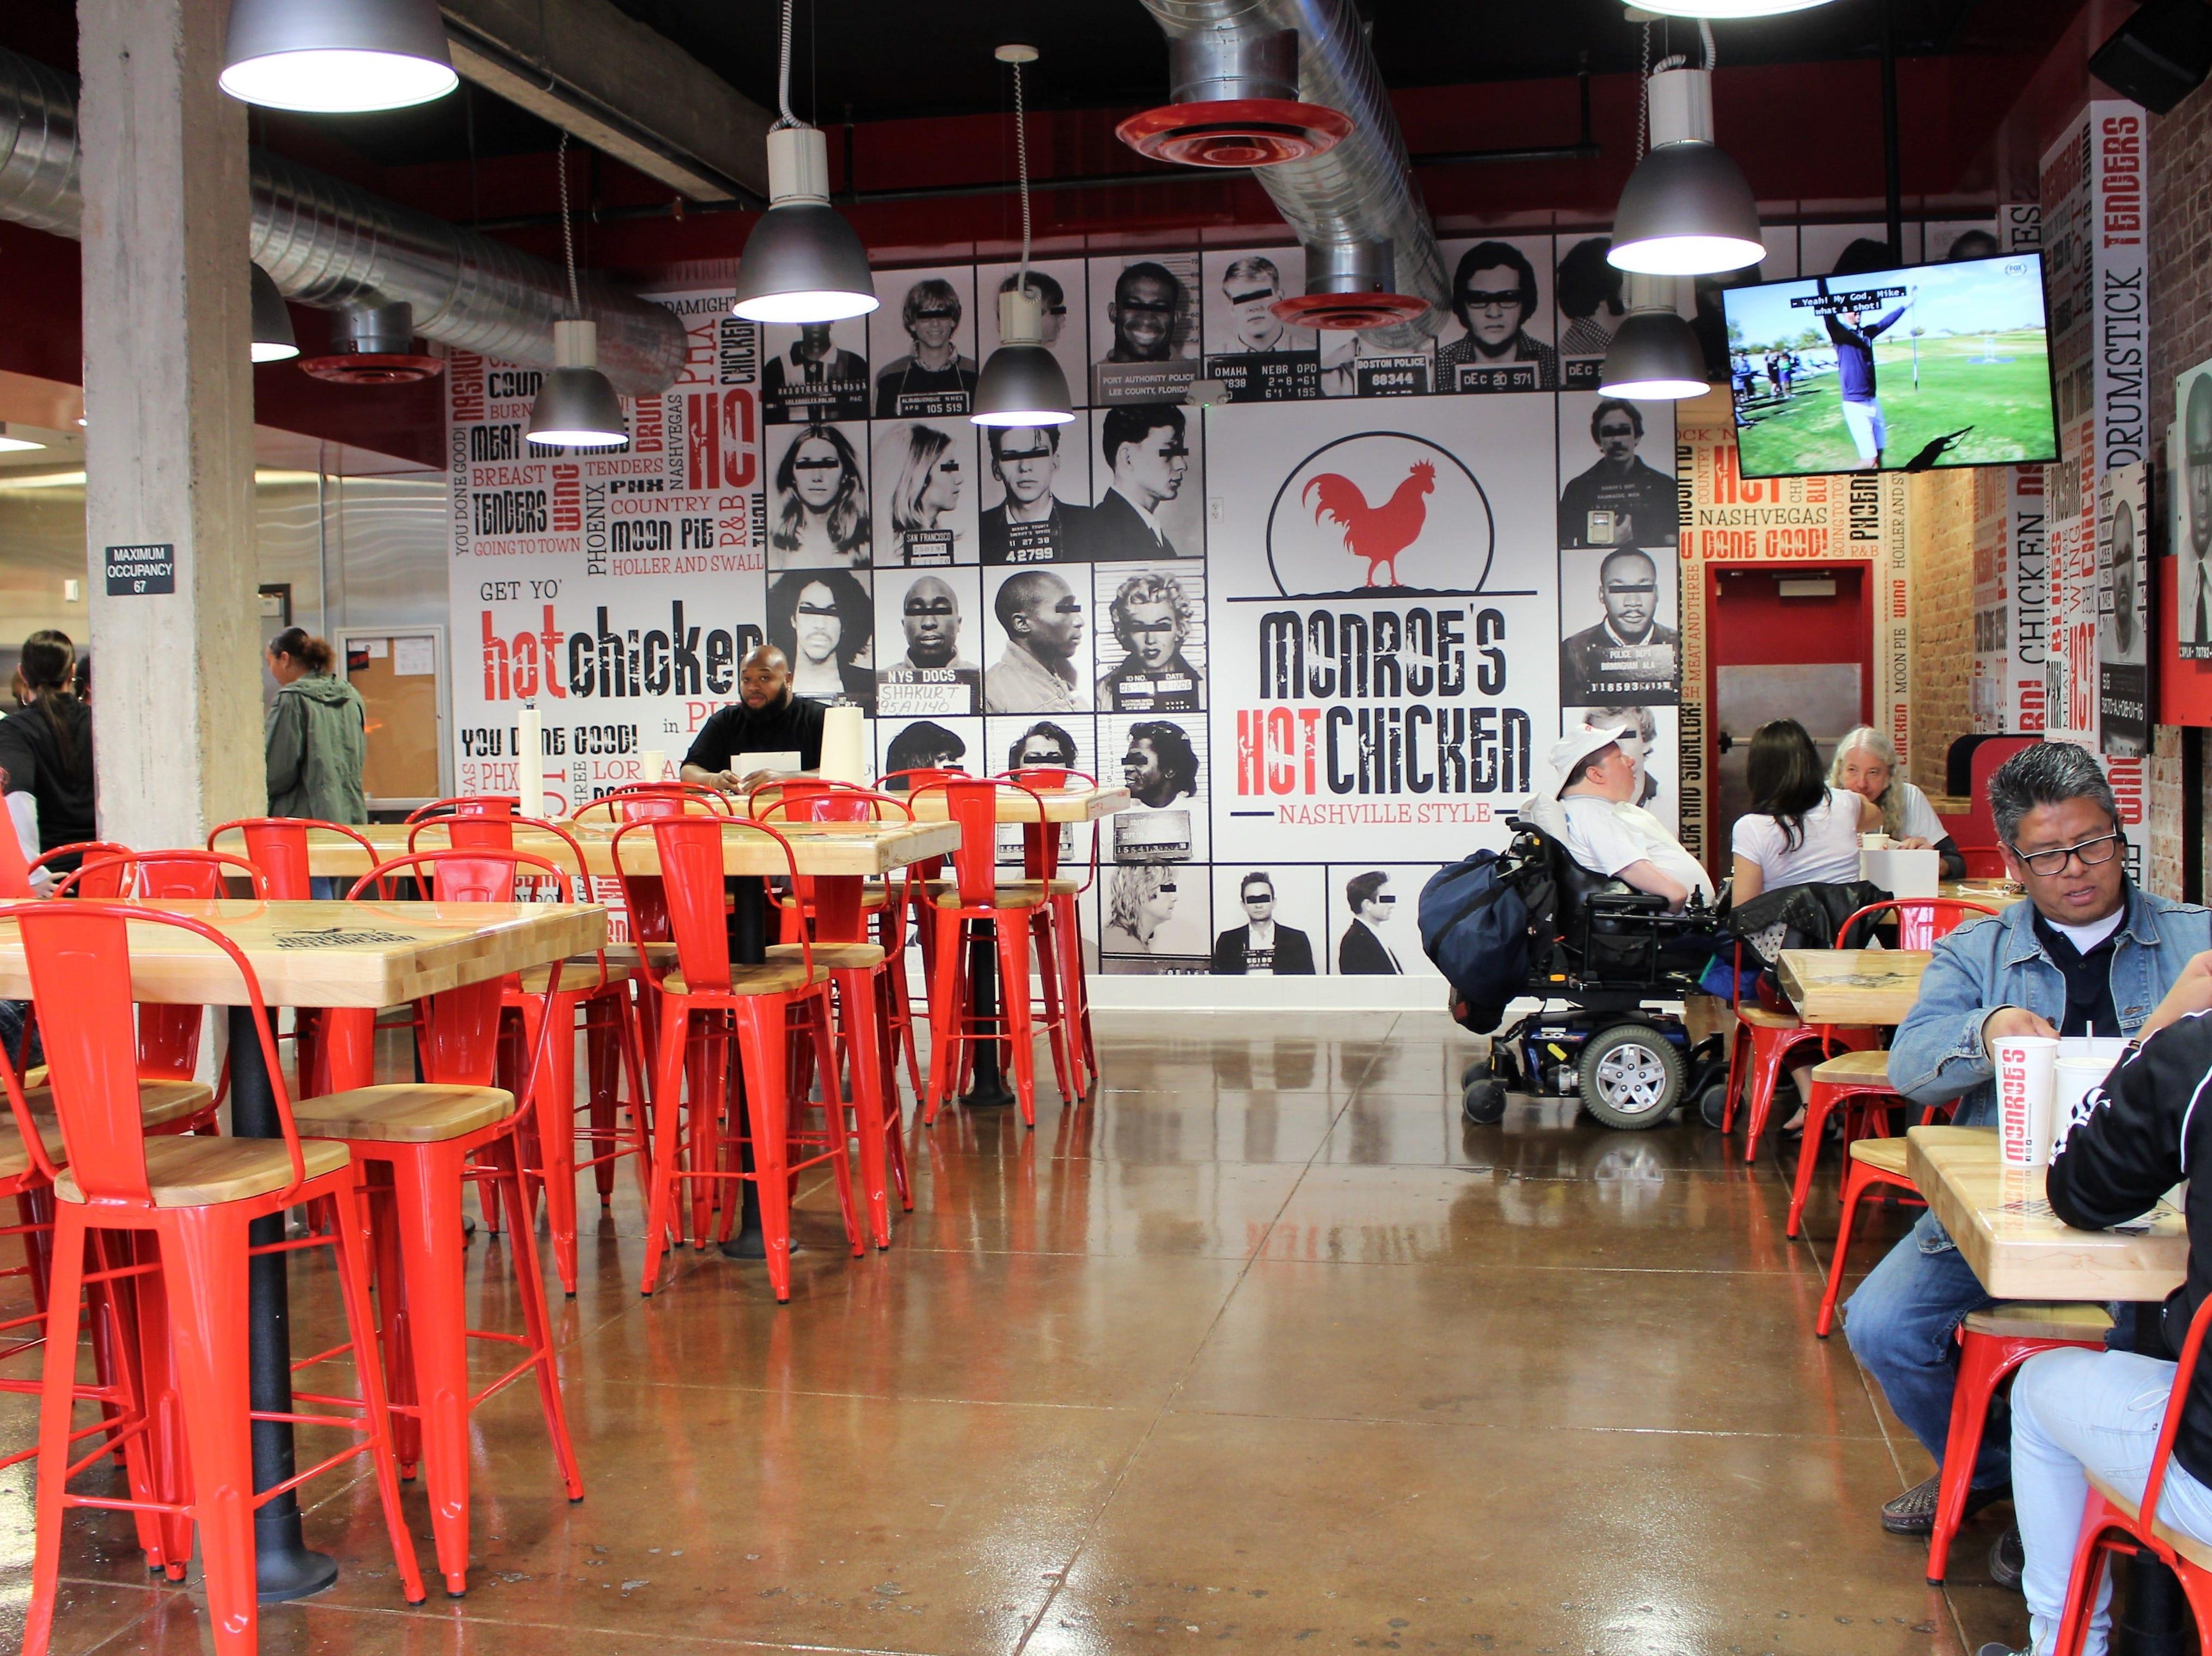 Monroe's Hot Chicken is the first restaurant to specialize in Nashville-style hot chicken in metro Phoenix.